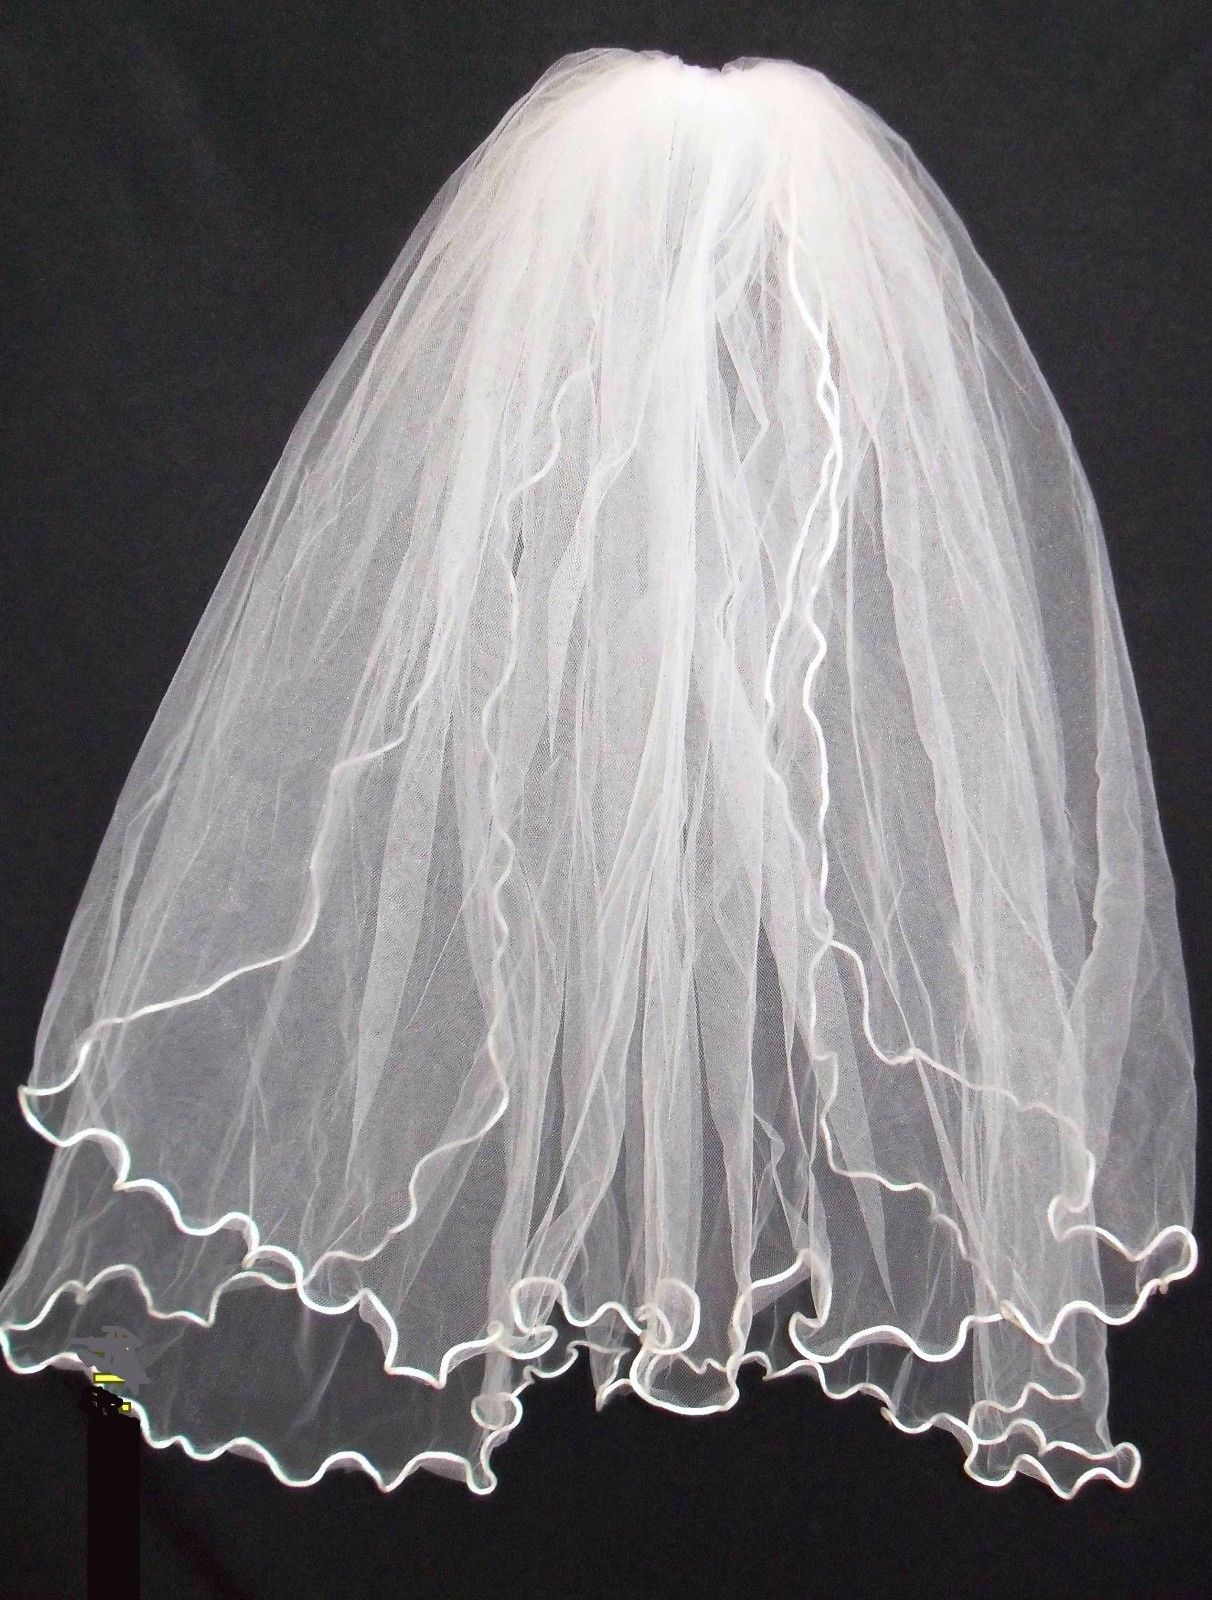 Unotux Girls 1st Communion Dress Wedding White Veil 2 Layers